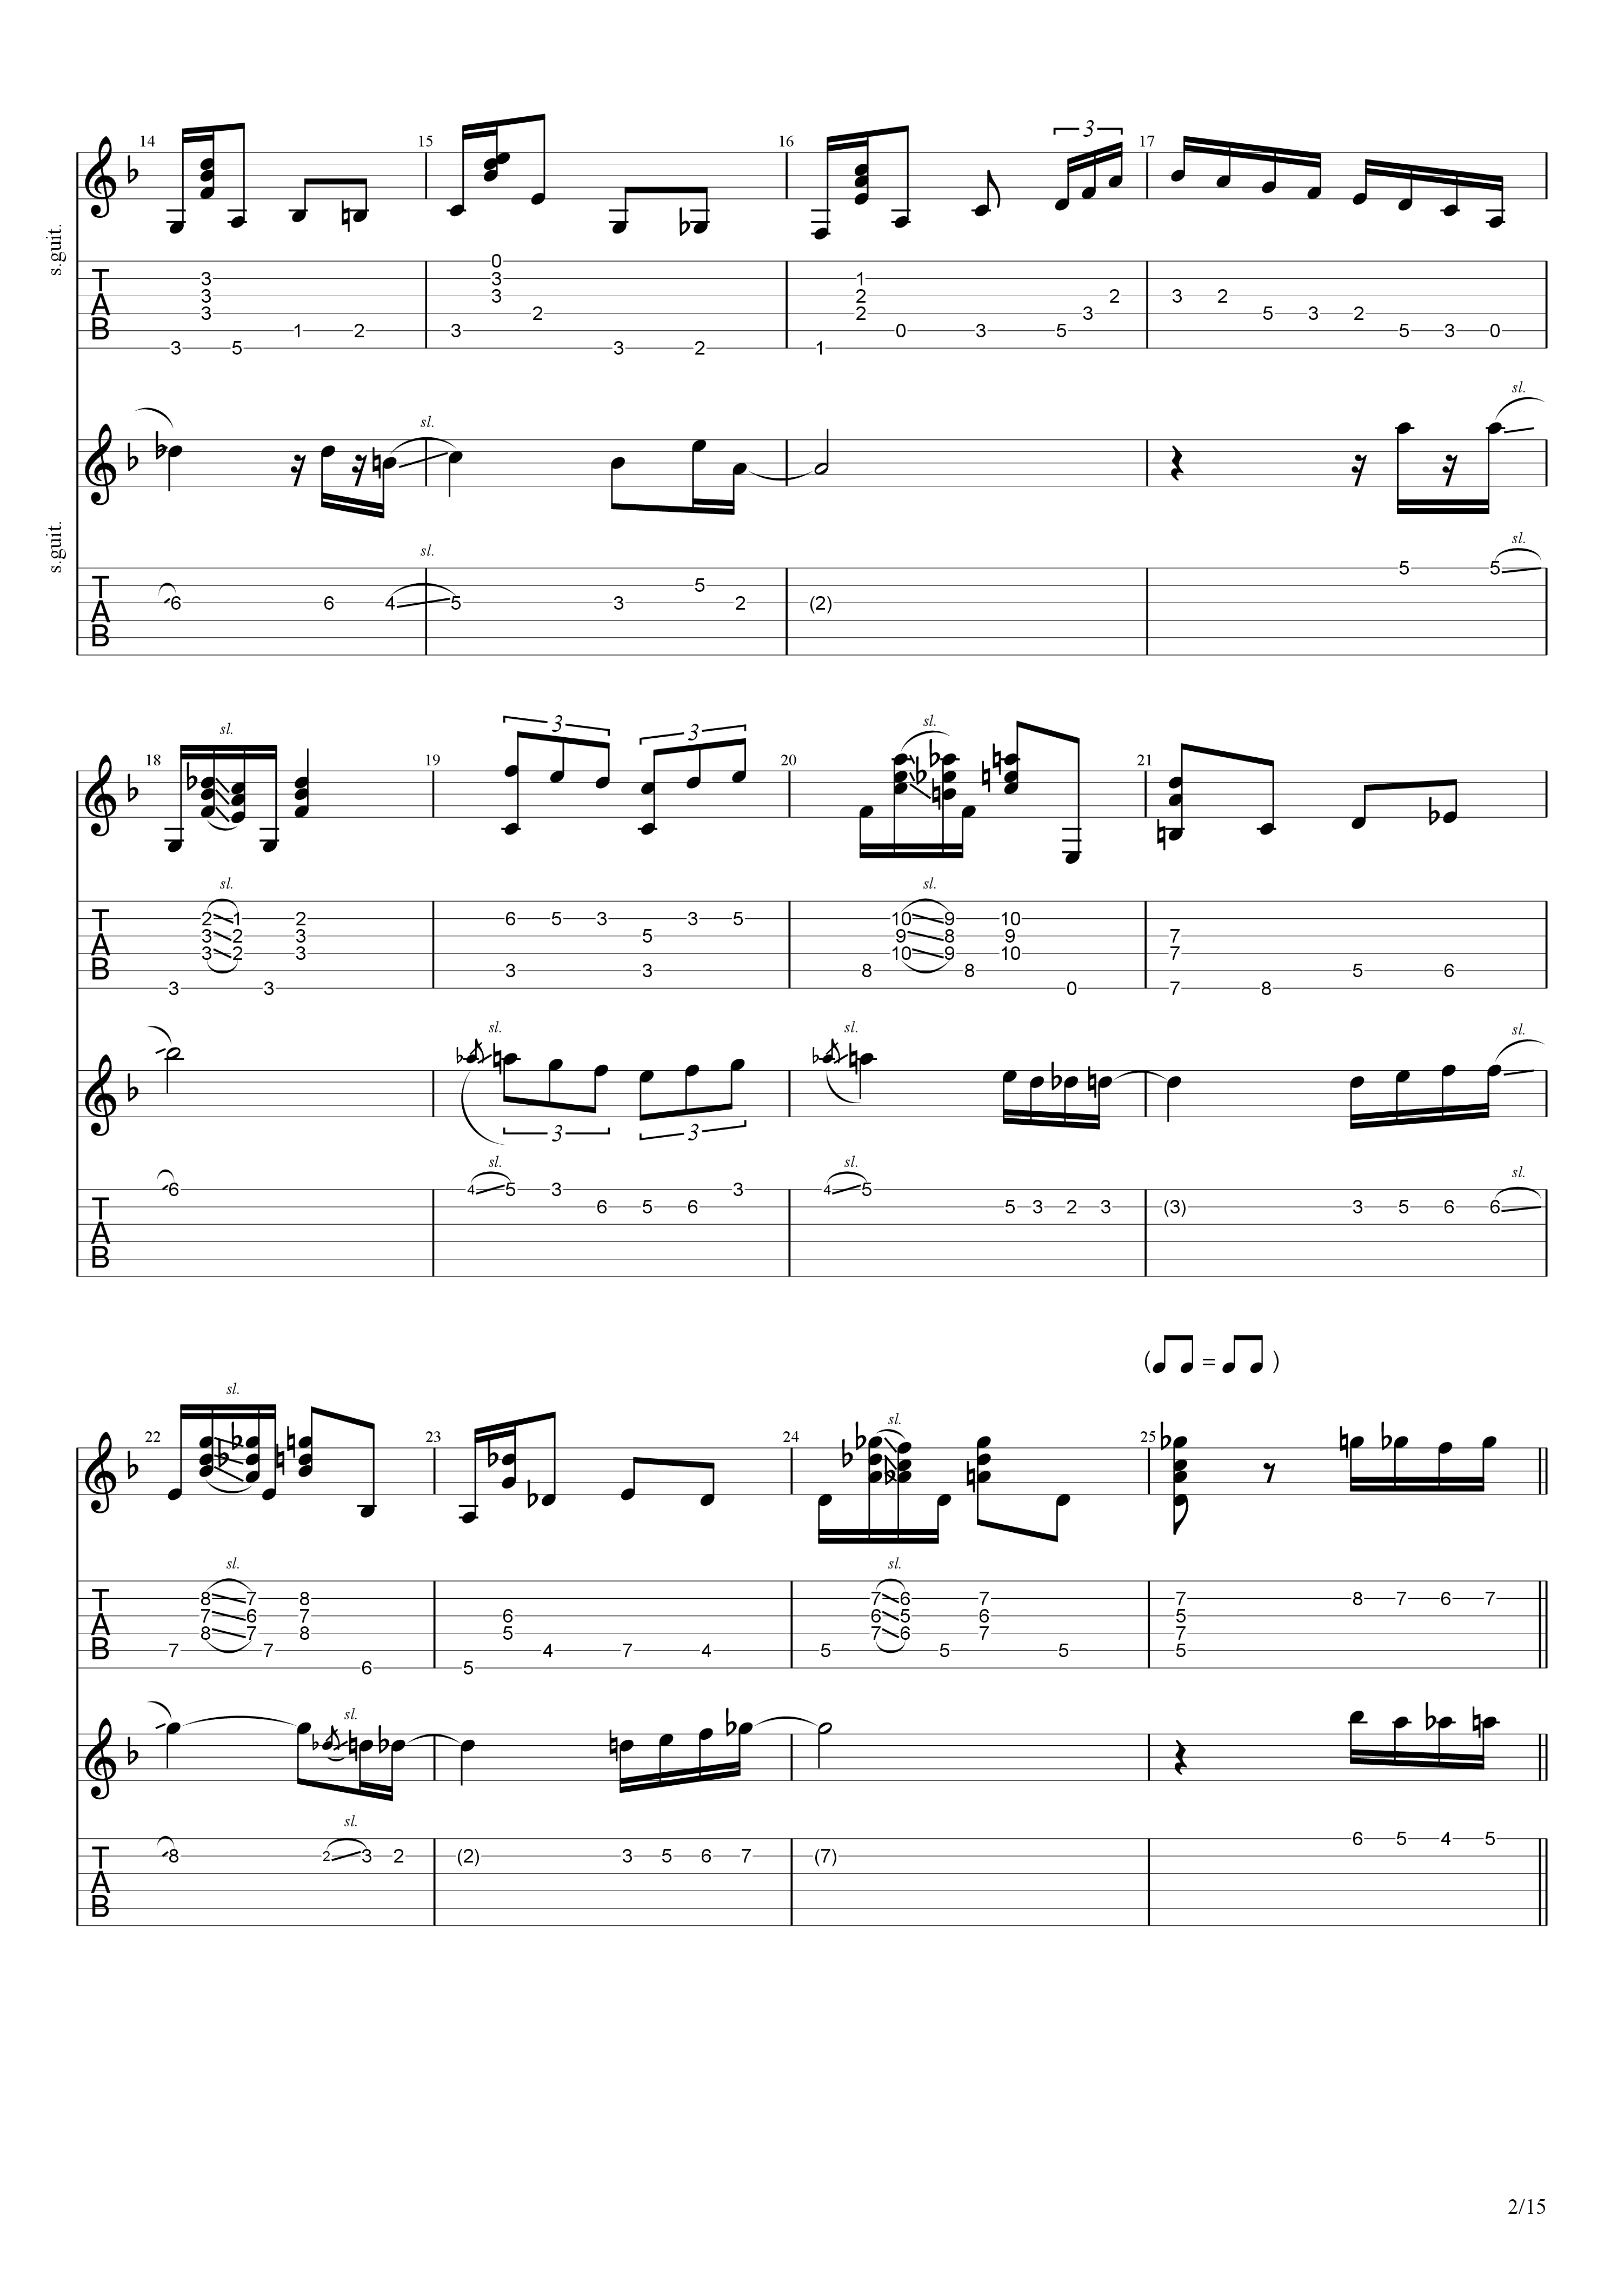 Labyrinth (松井佑贵&井草圣二)吉他谱2